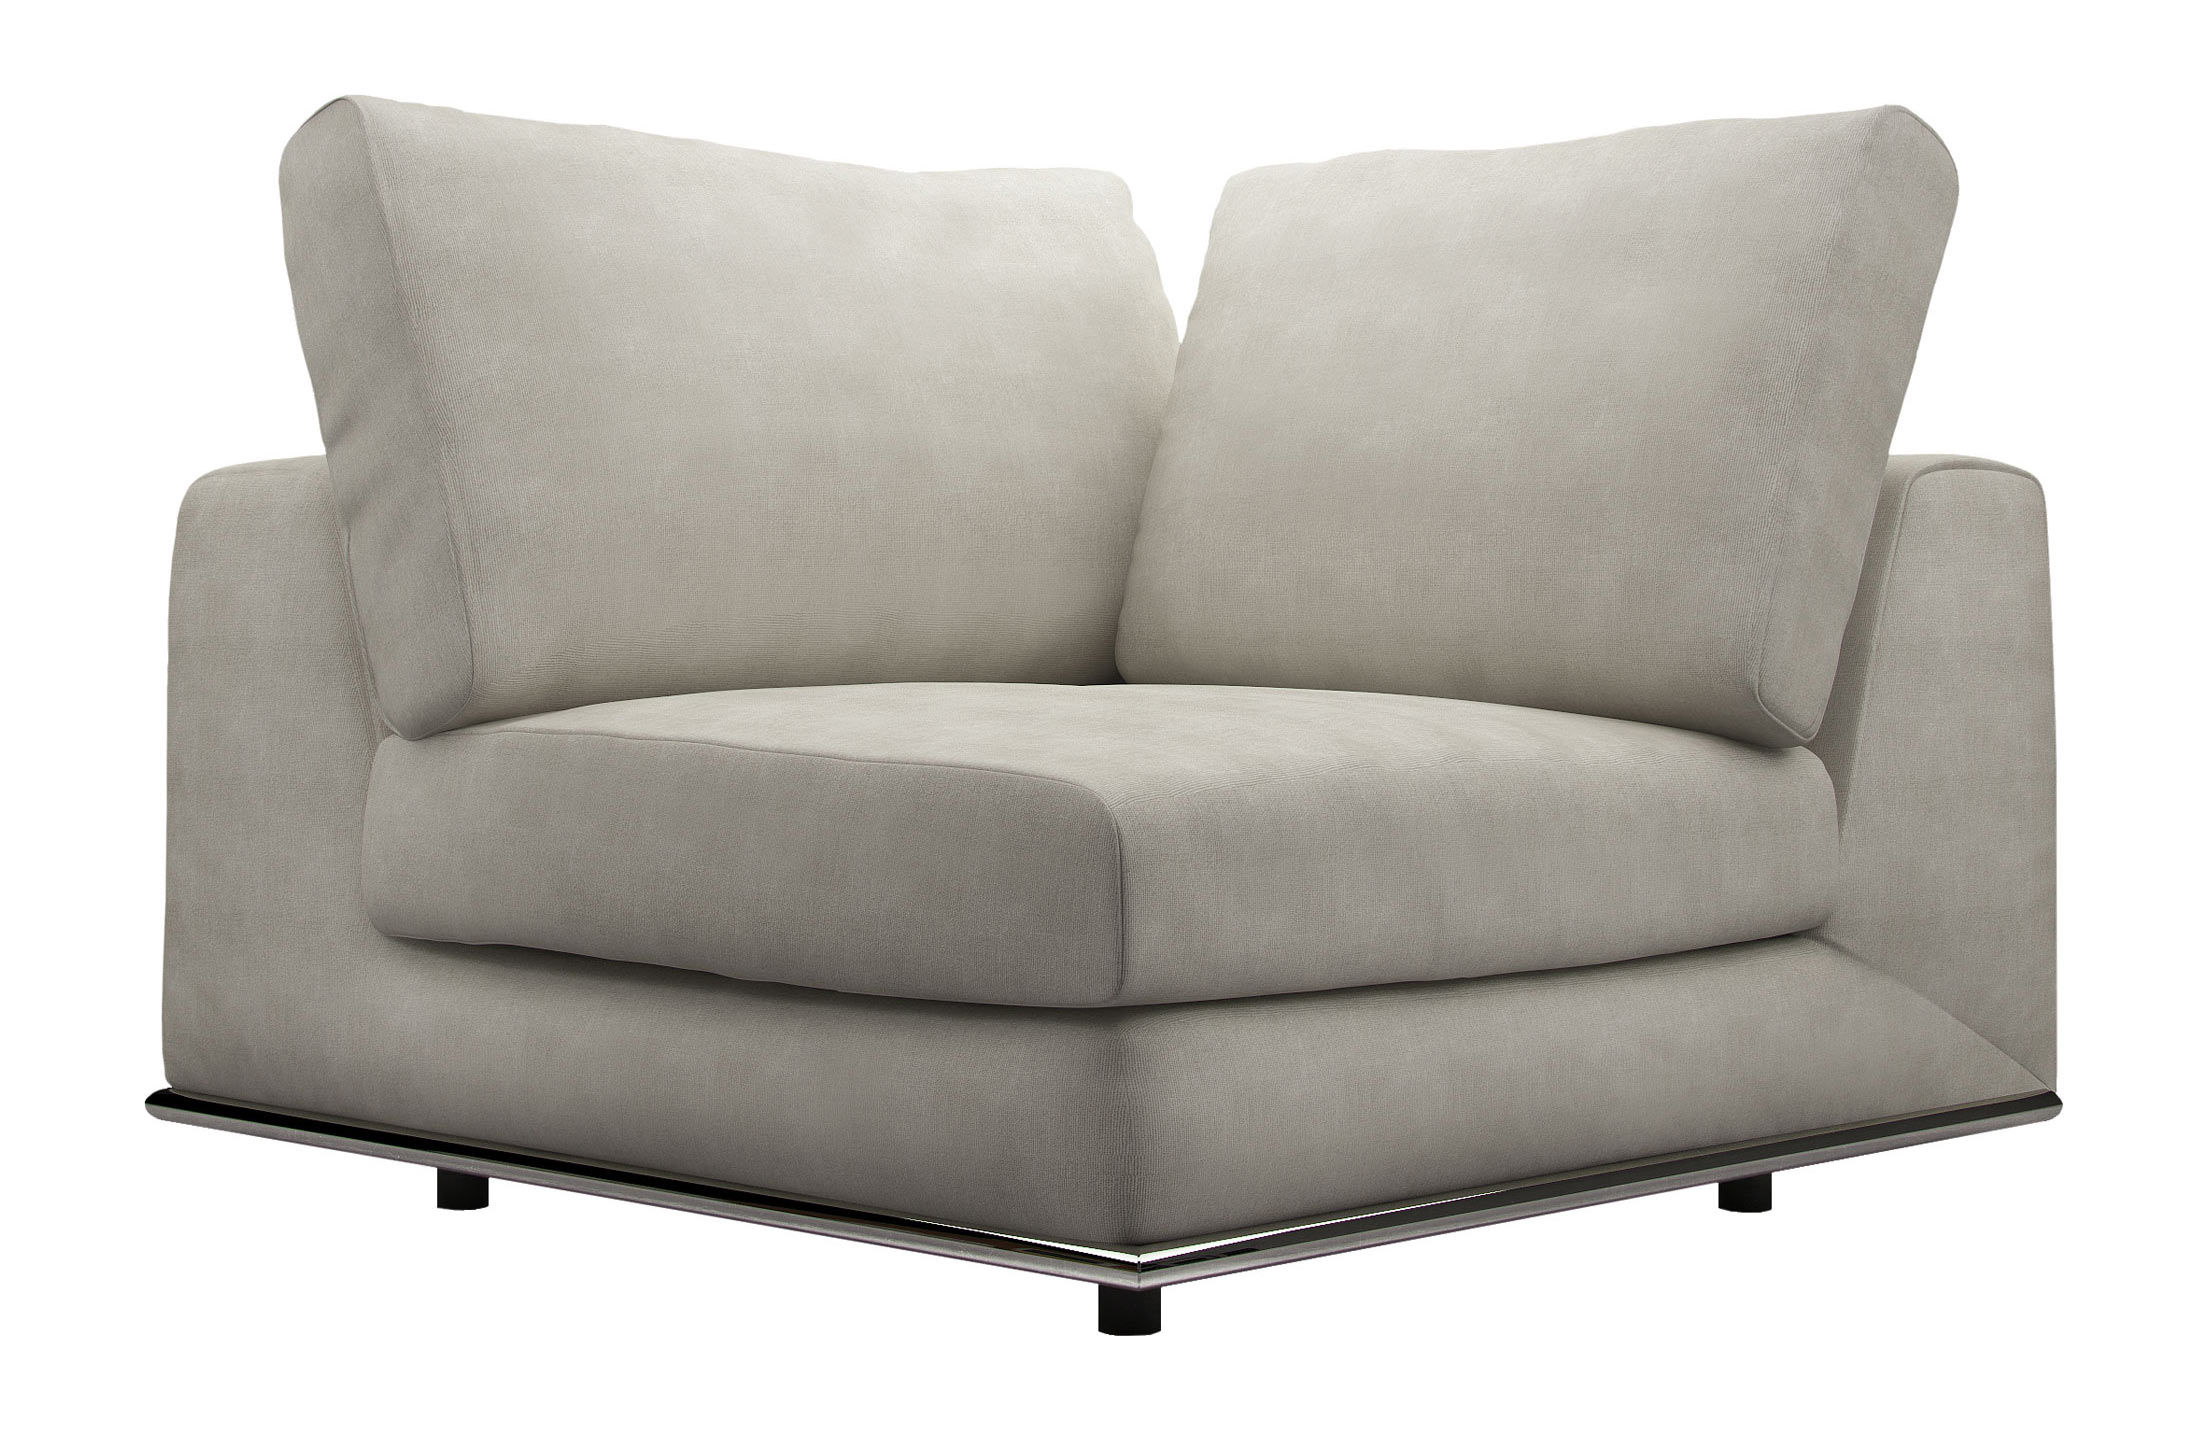 Cool Perry Modular Corner Chair Moonbeam By Modloft Pabps2019 Chair Design Images Pabps2019Com